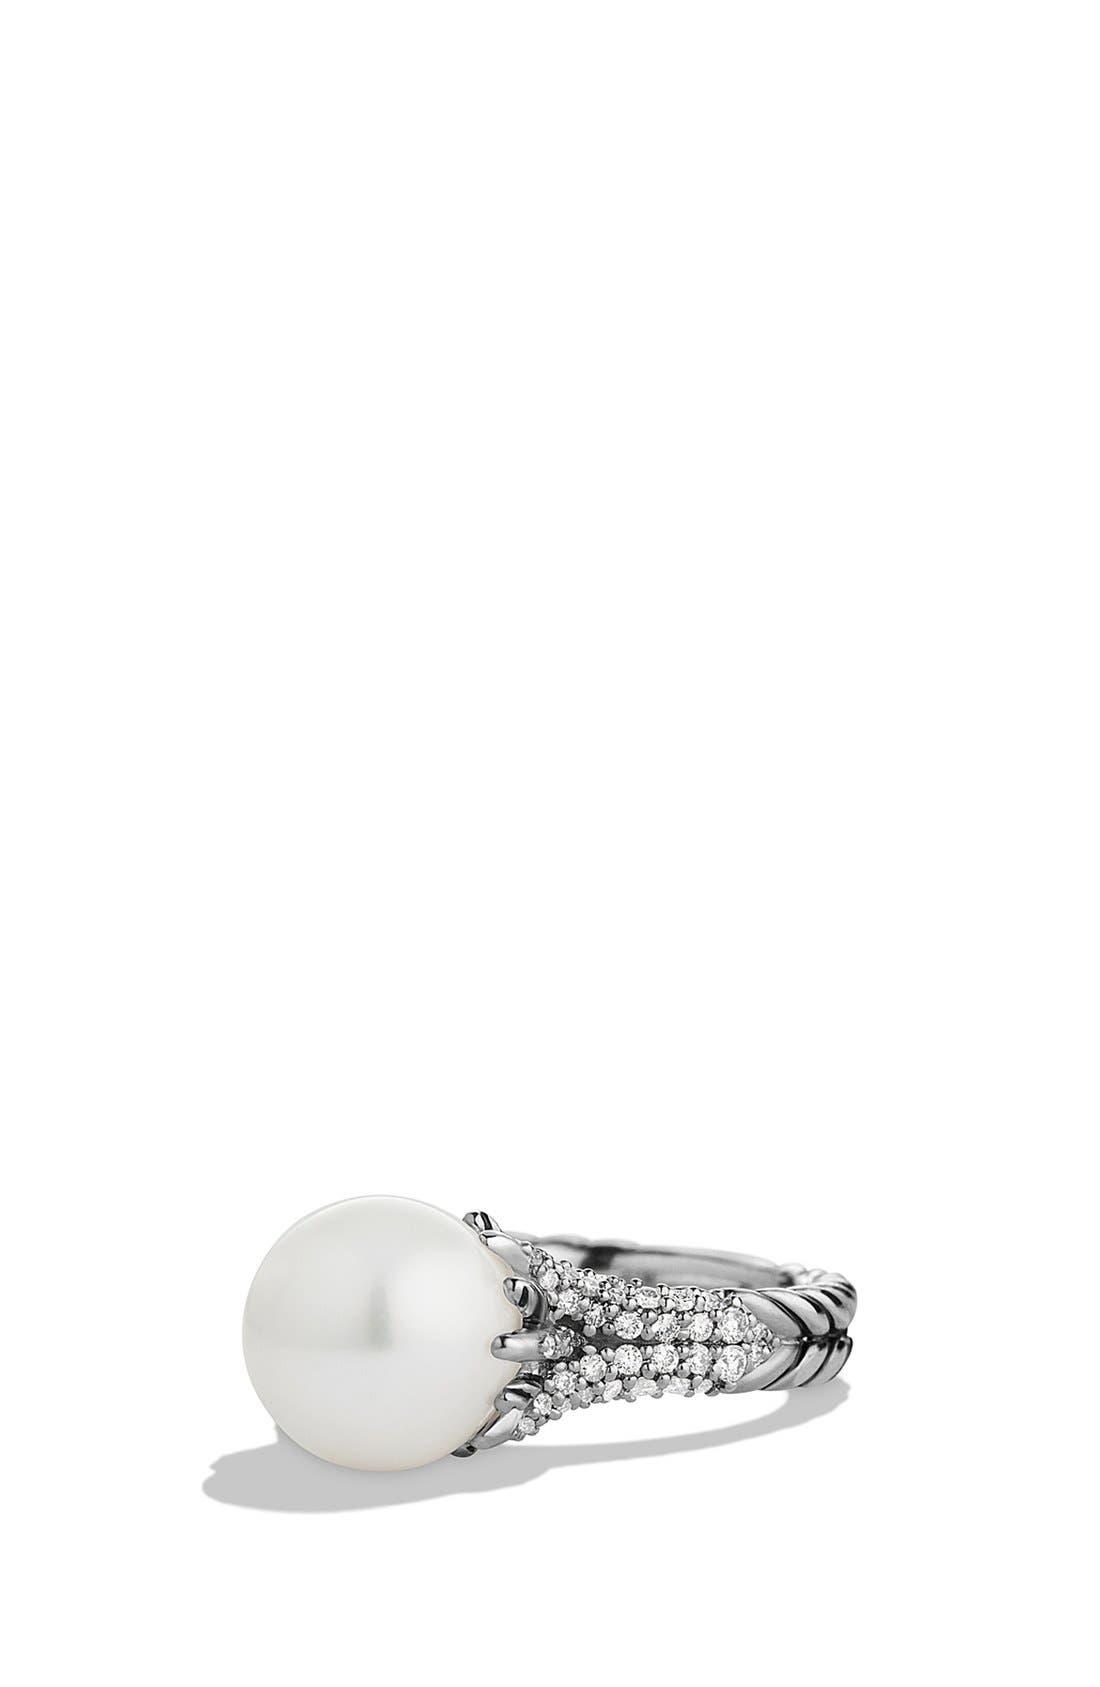 Alternate Image 1 Selected - David Yurman 'Starburst' Pearl Ring with Diamonds